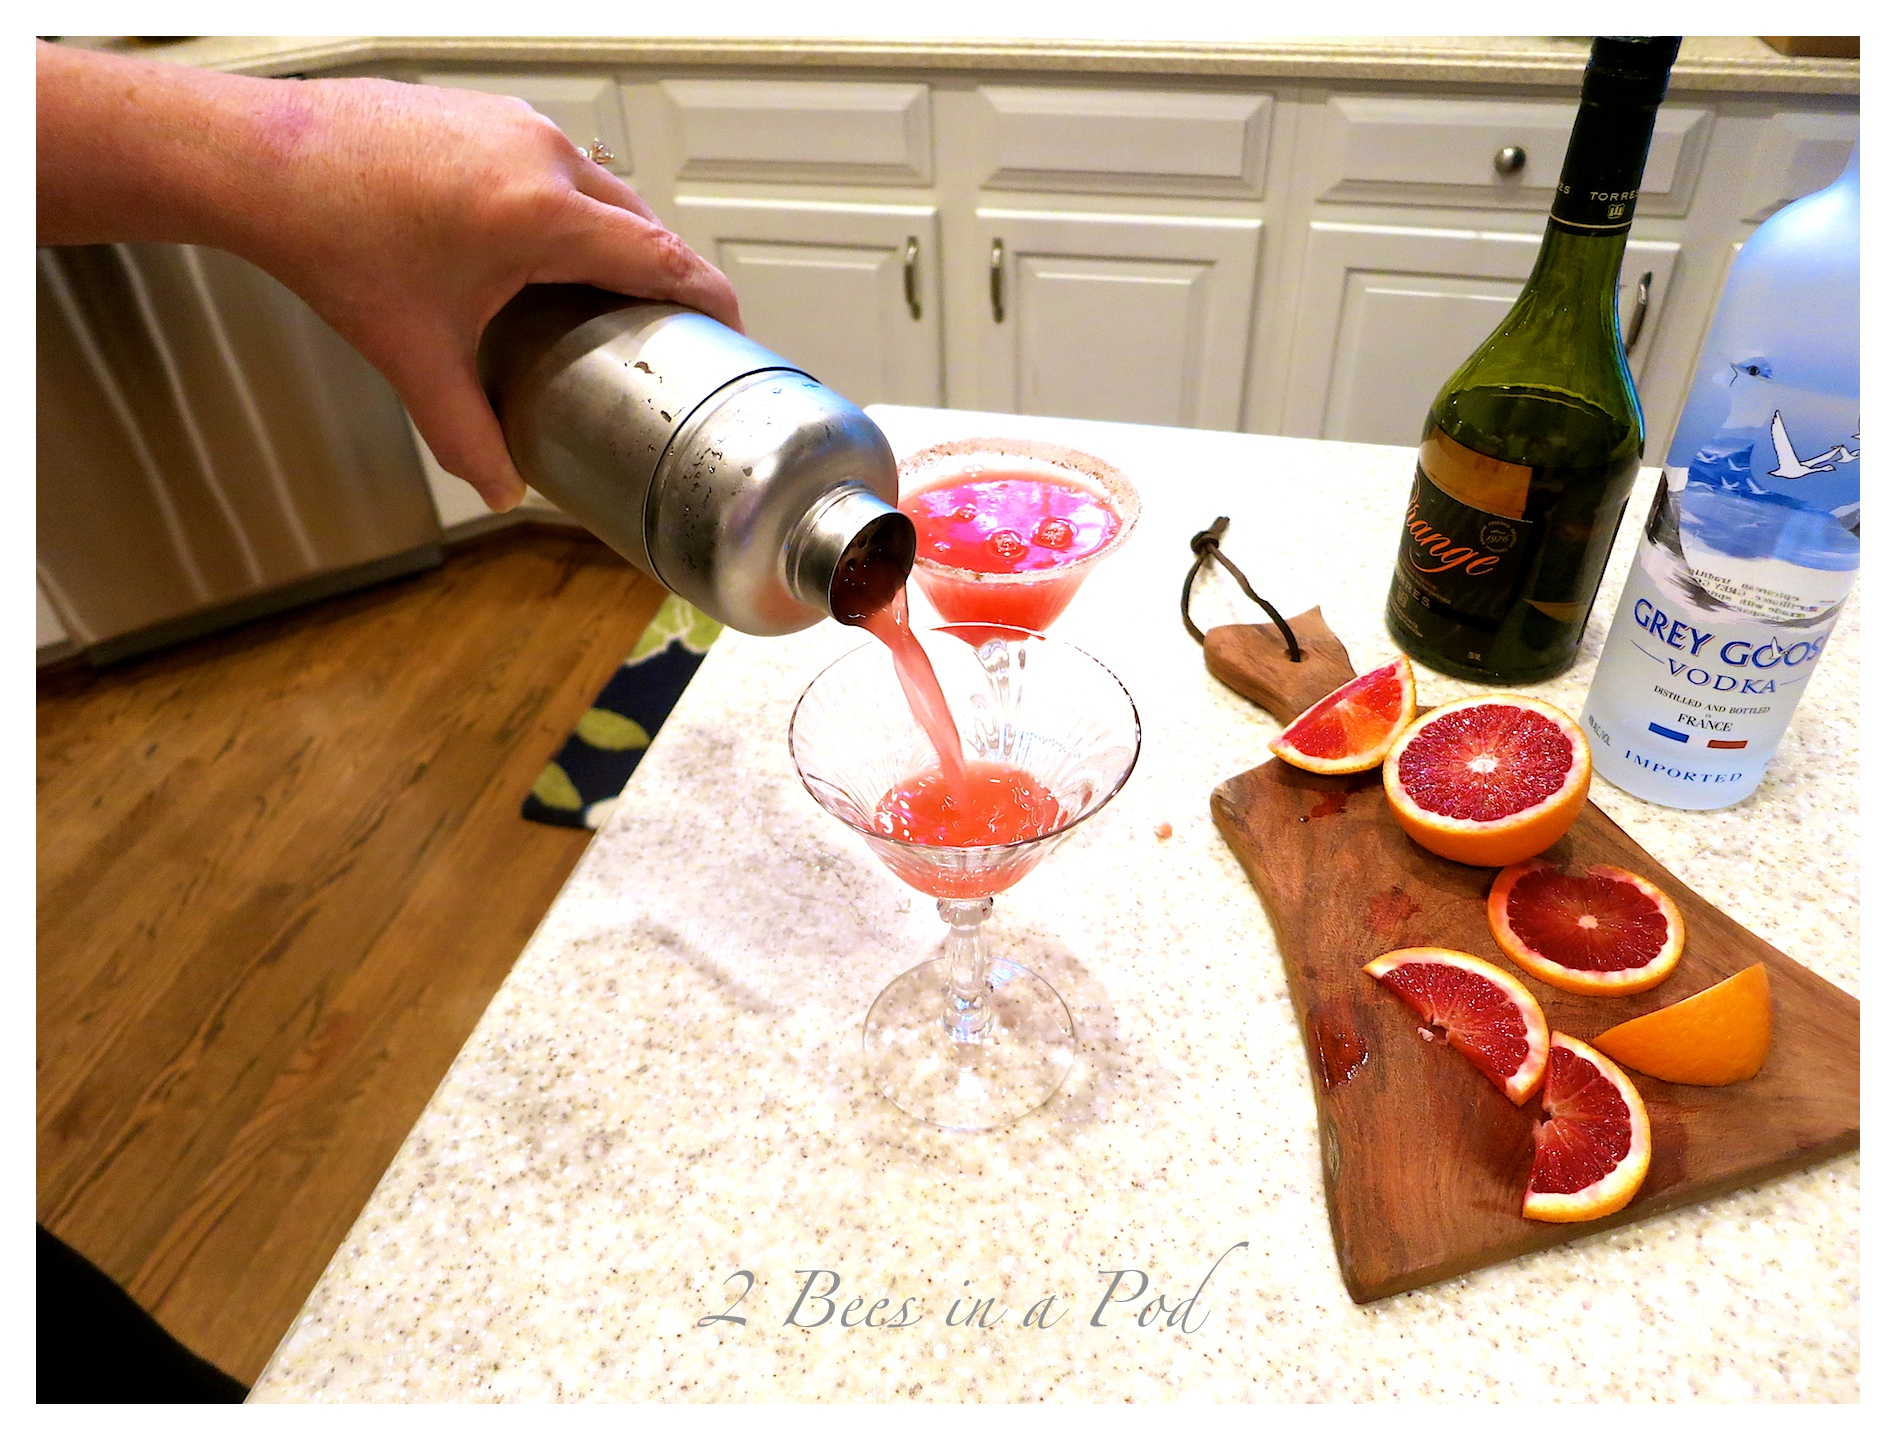 Yummy Blood Orange Martini - the perfect Christmas cocktail. Fresh squeezed Blood Orange juice, vodka, orange liquor and simple syrup.